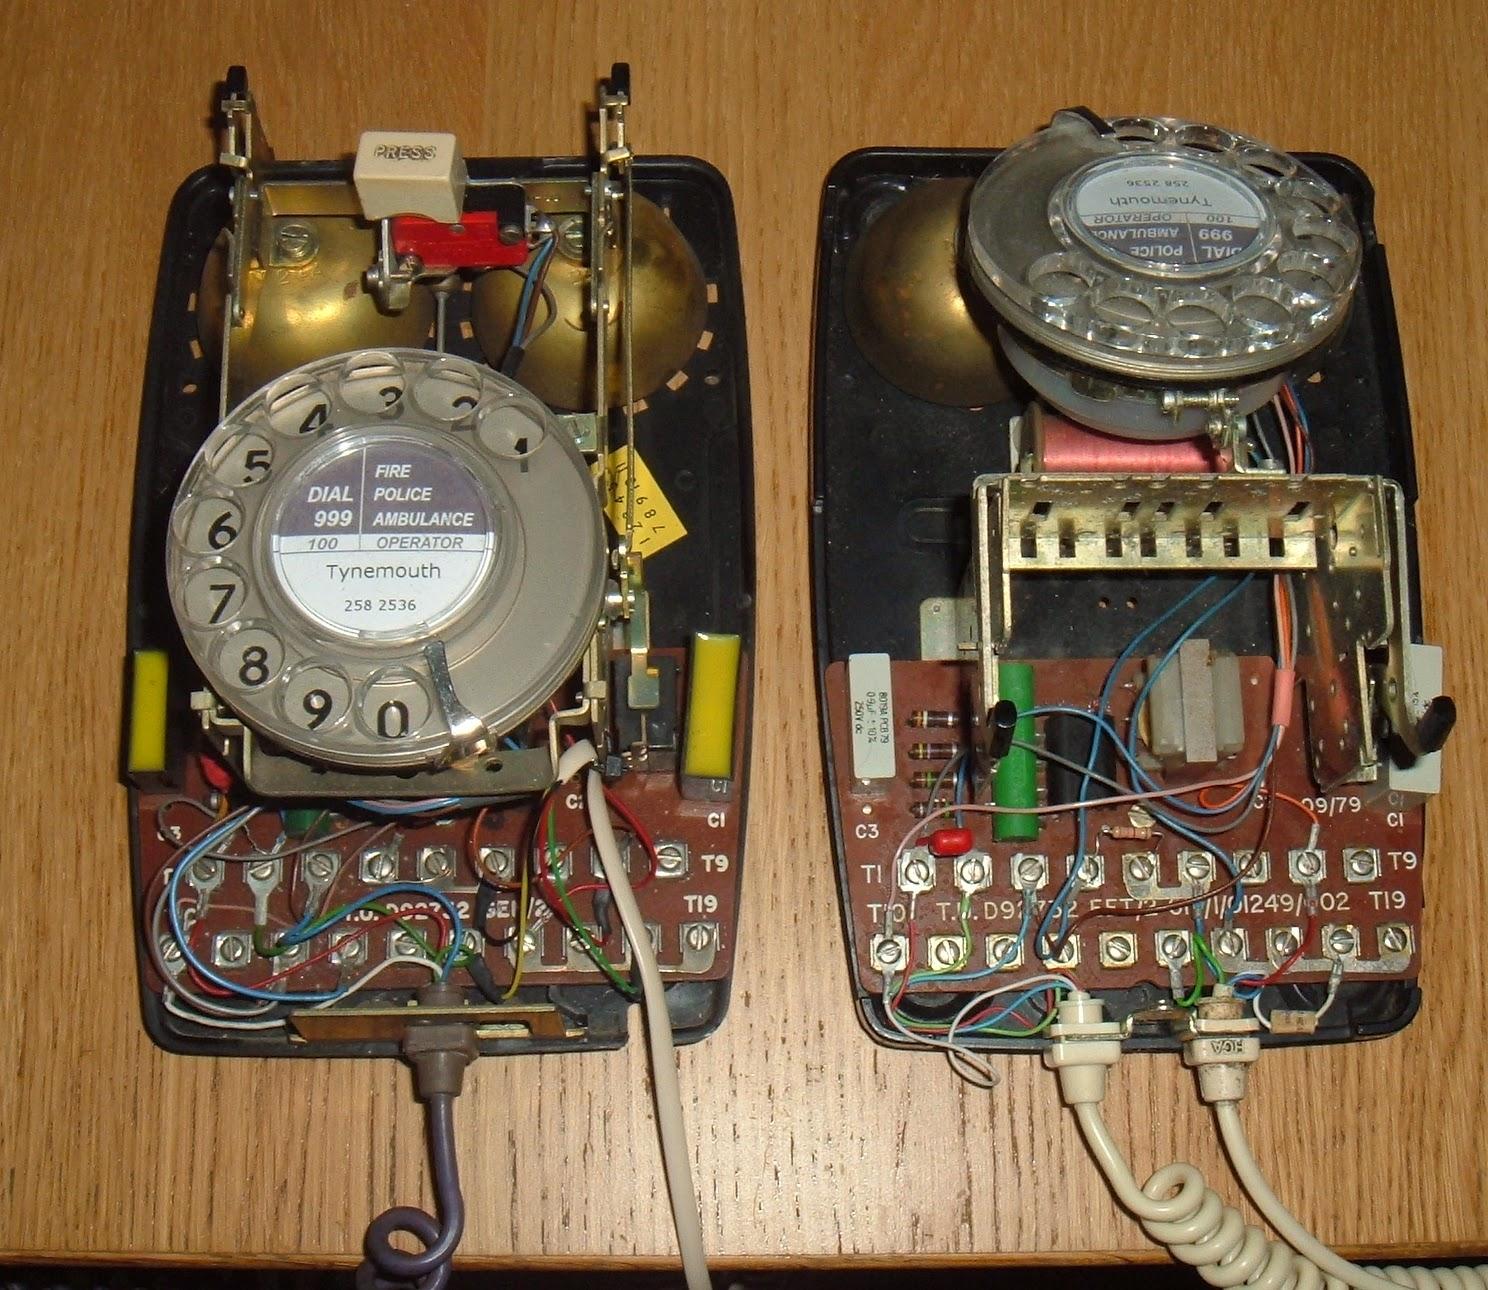 Tynemouth Software Bt 741 Wallphone Conversion